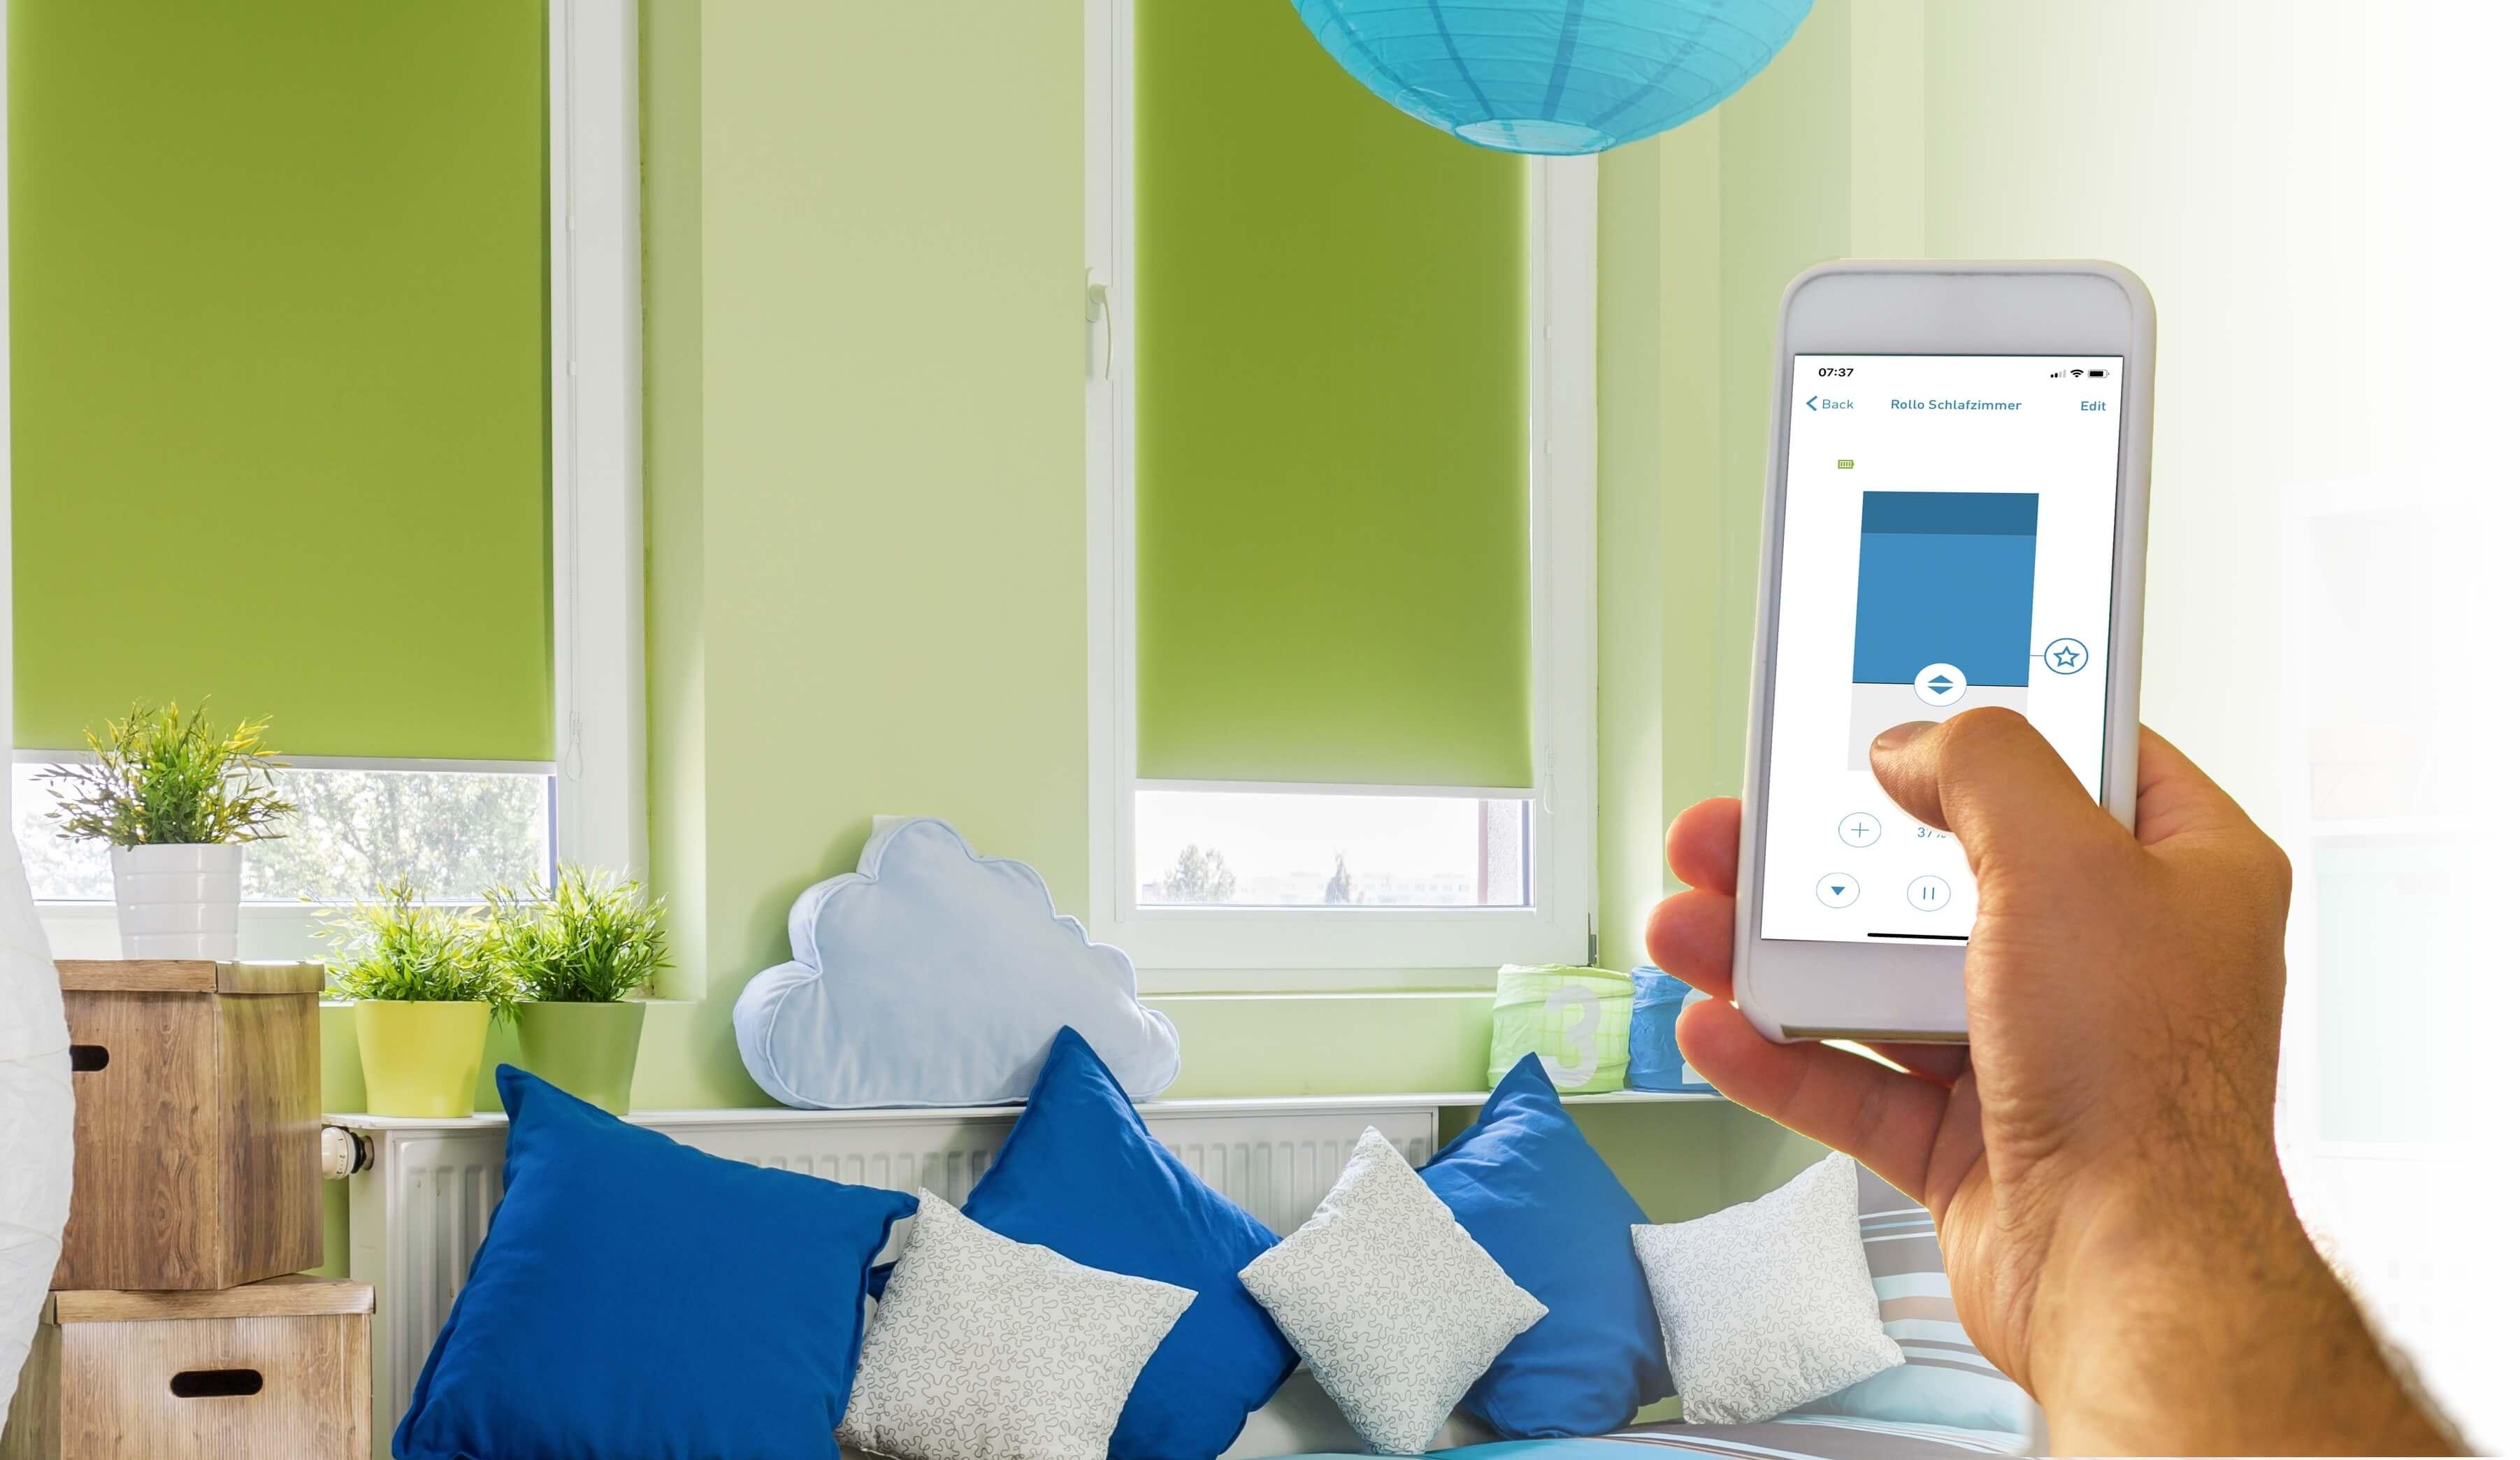 smart home rollos elektrisch siro shop rollos smart. Black Bedroom Furniture Sets. Home Design Ideas